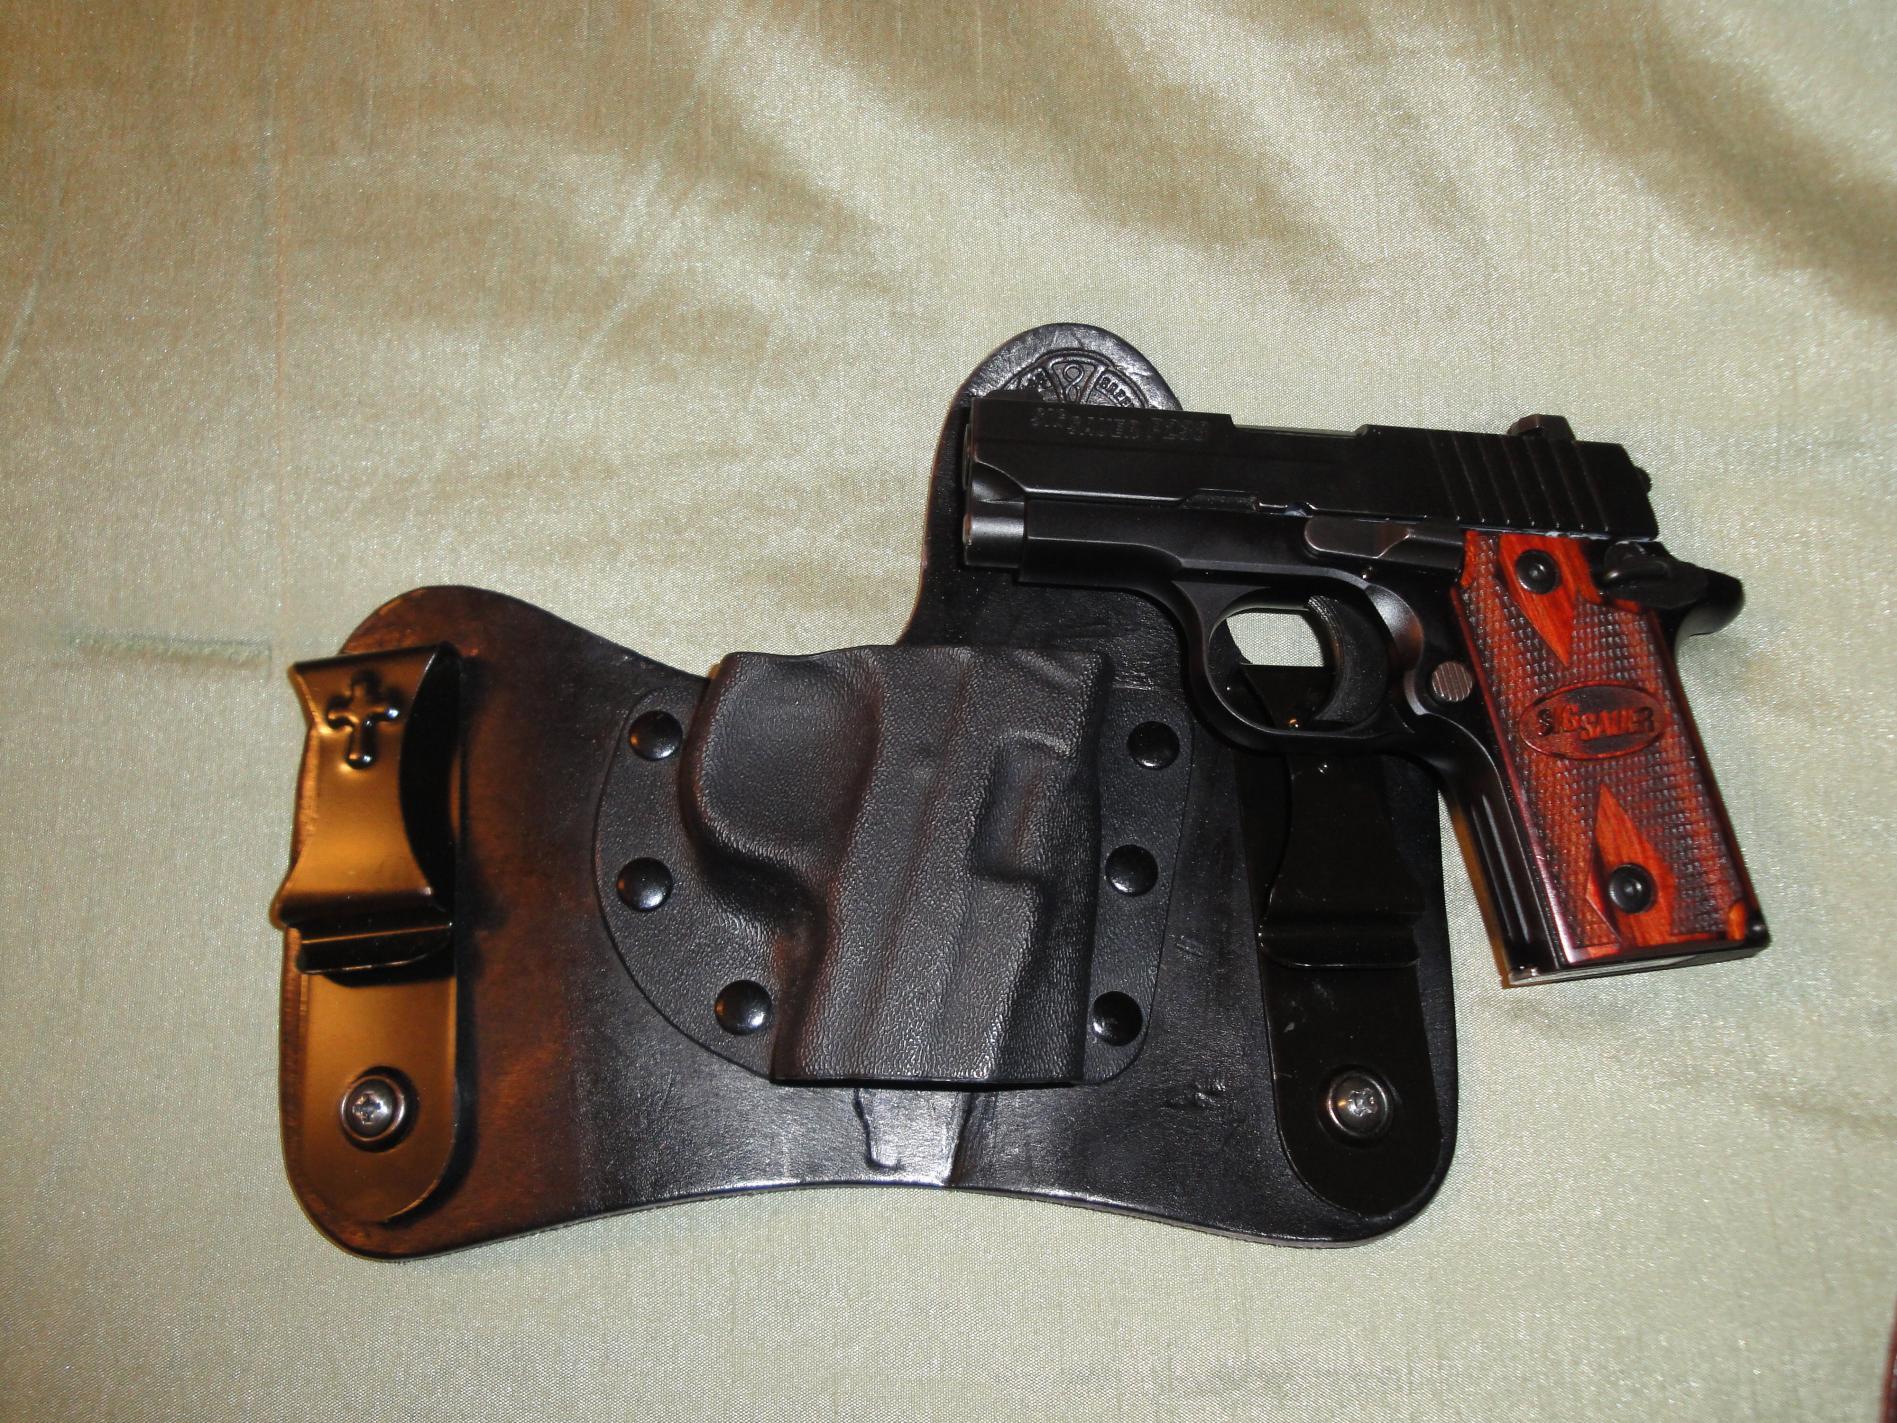 SIG P238 CC for a Skinny Guy-guns-002.jpg